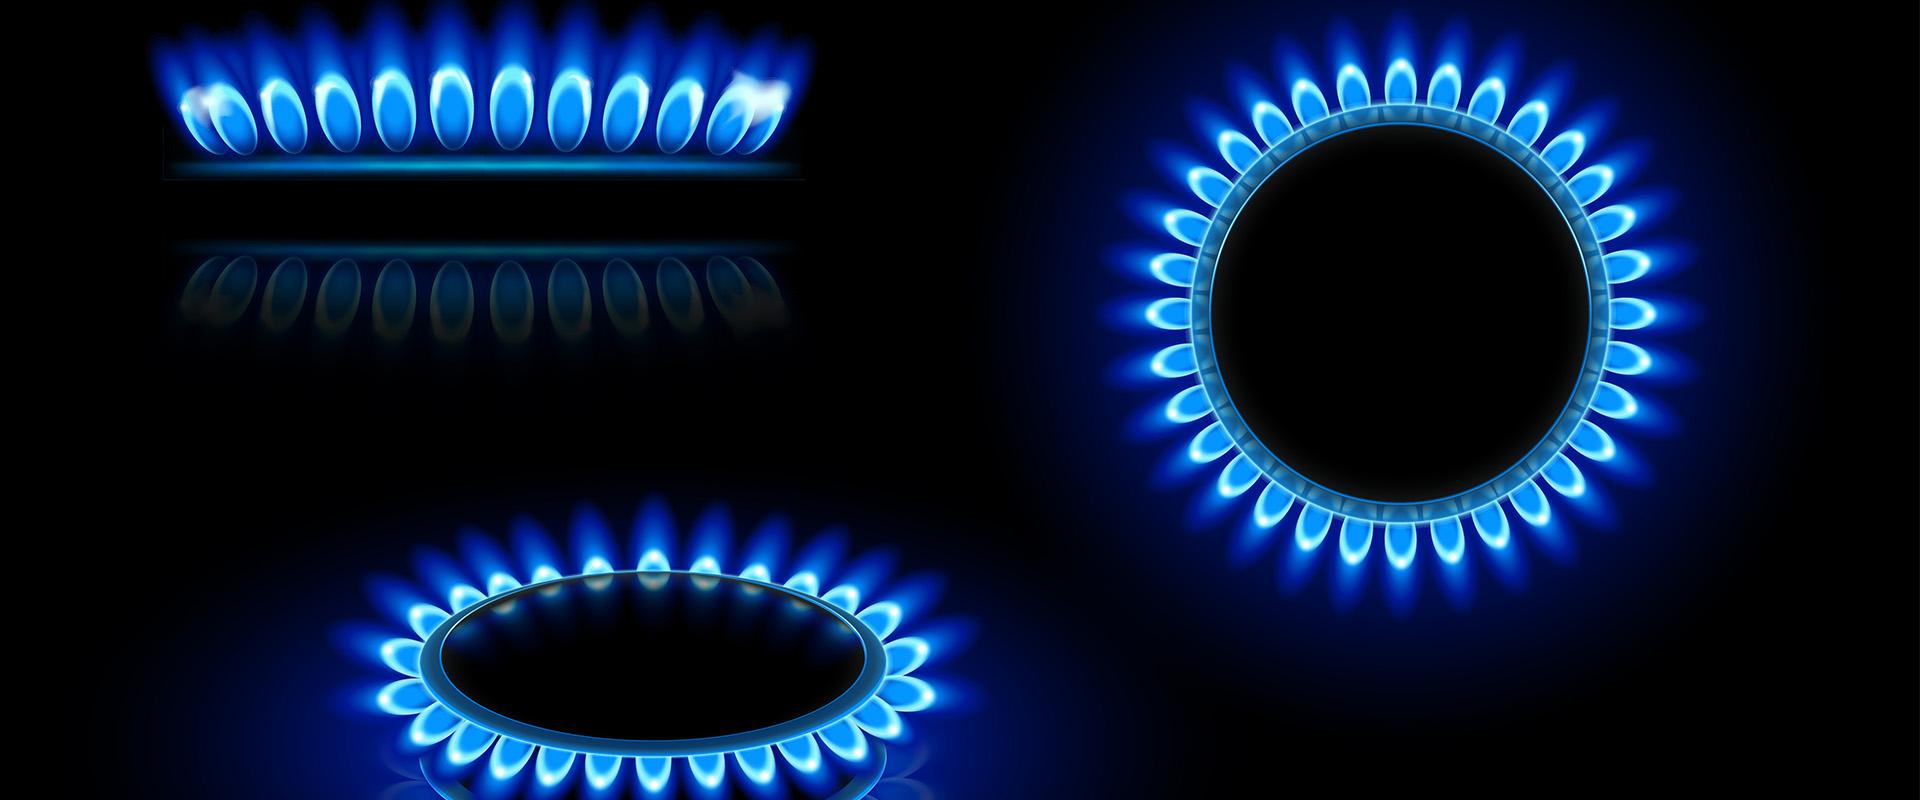 Méthane, butane ou propane